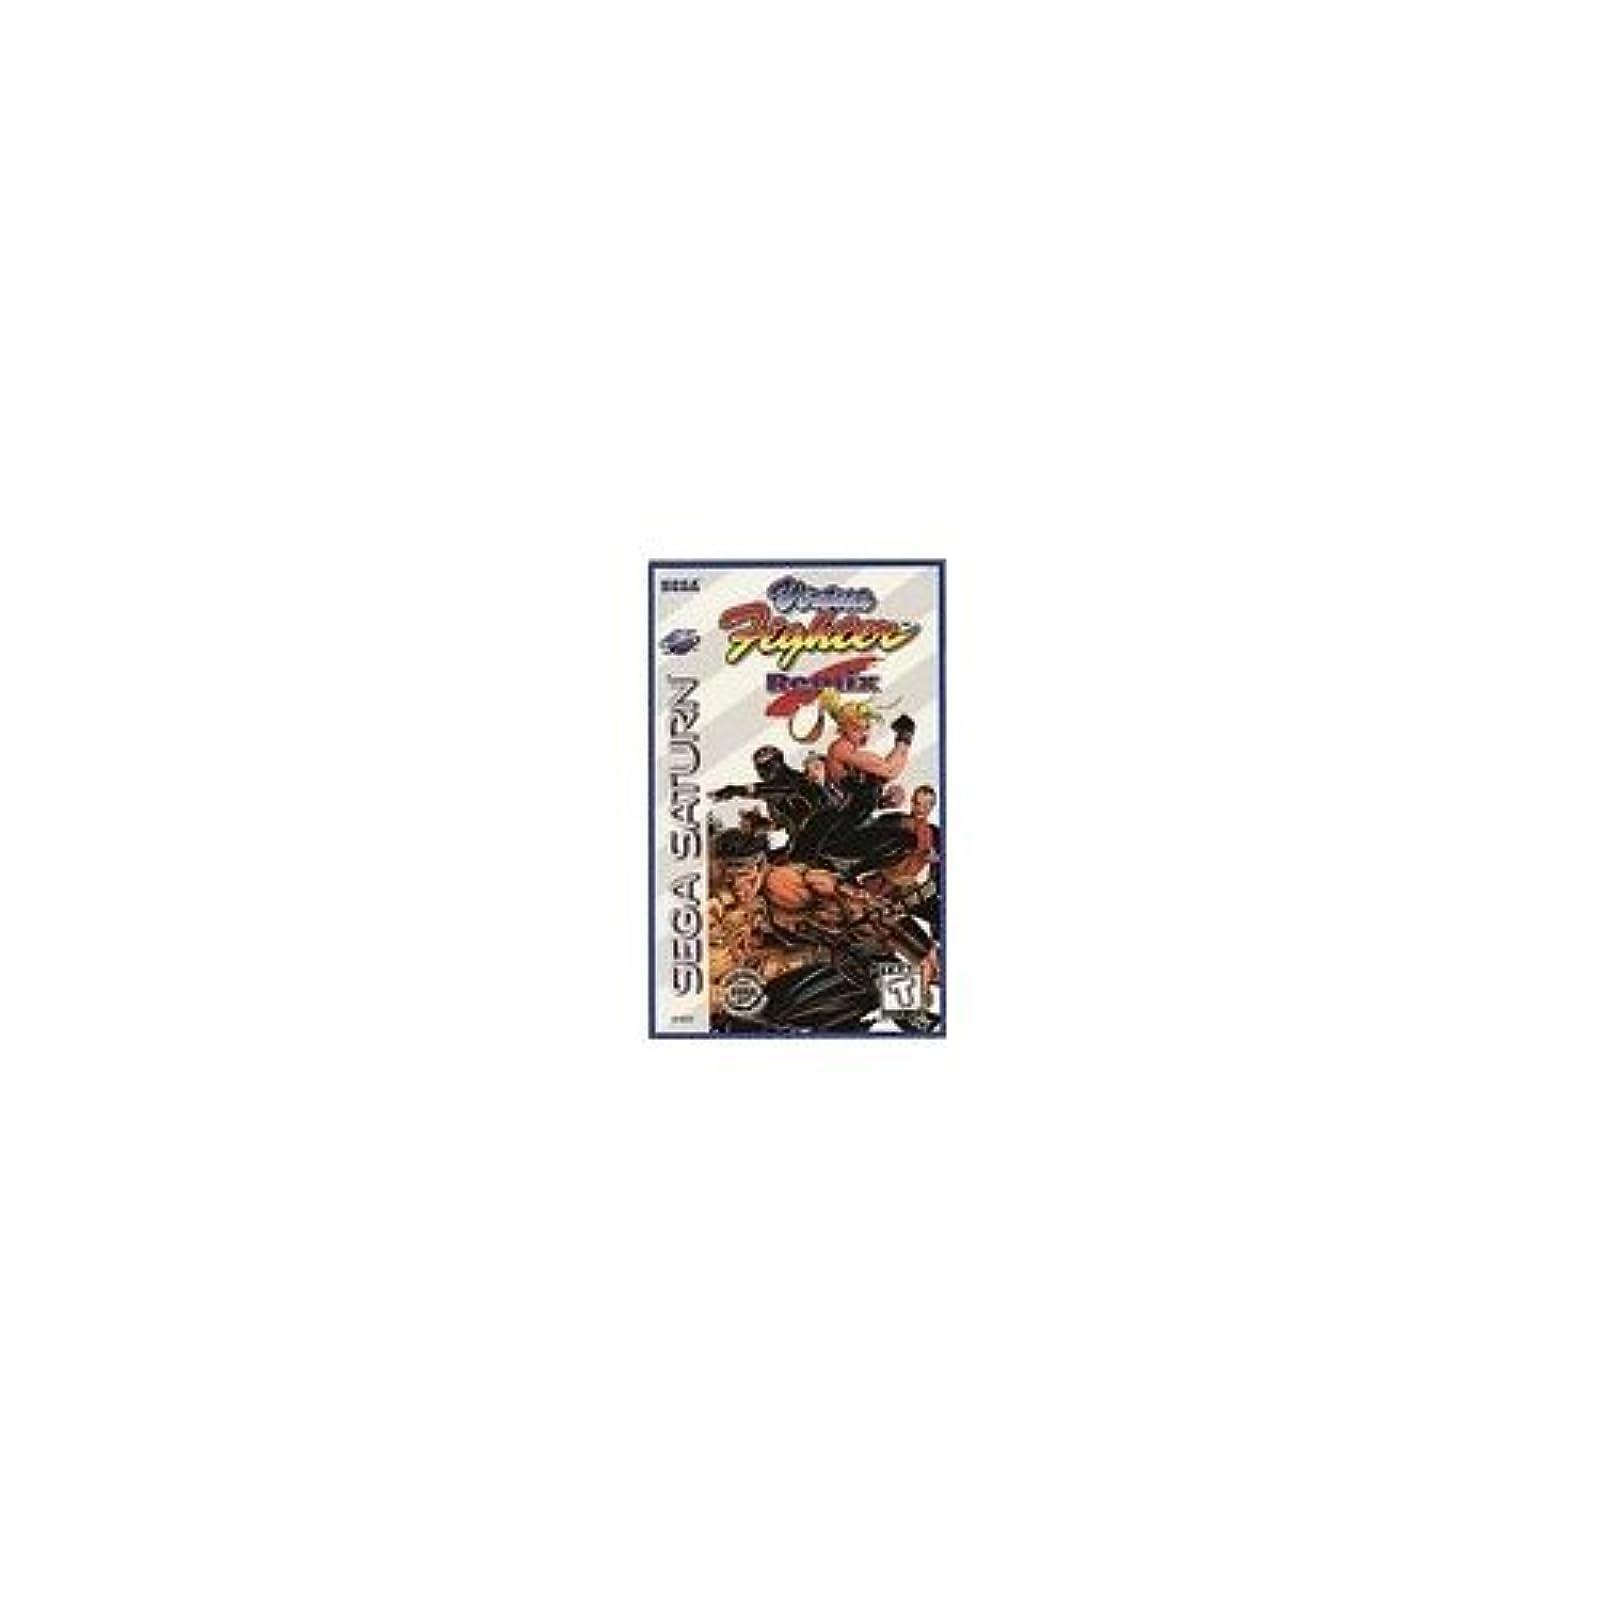 Virtua Fighter Remix For Sega Saturn Vintage Fighting